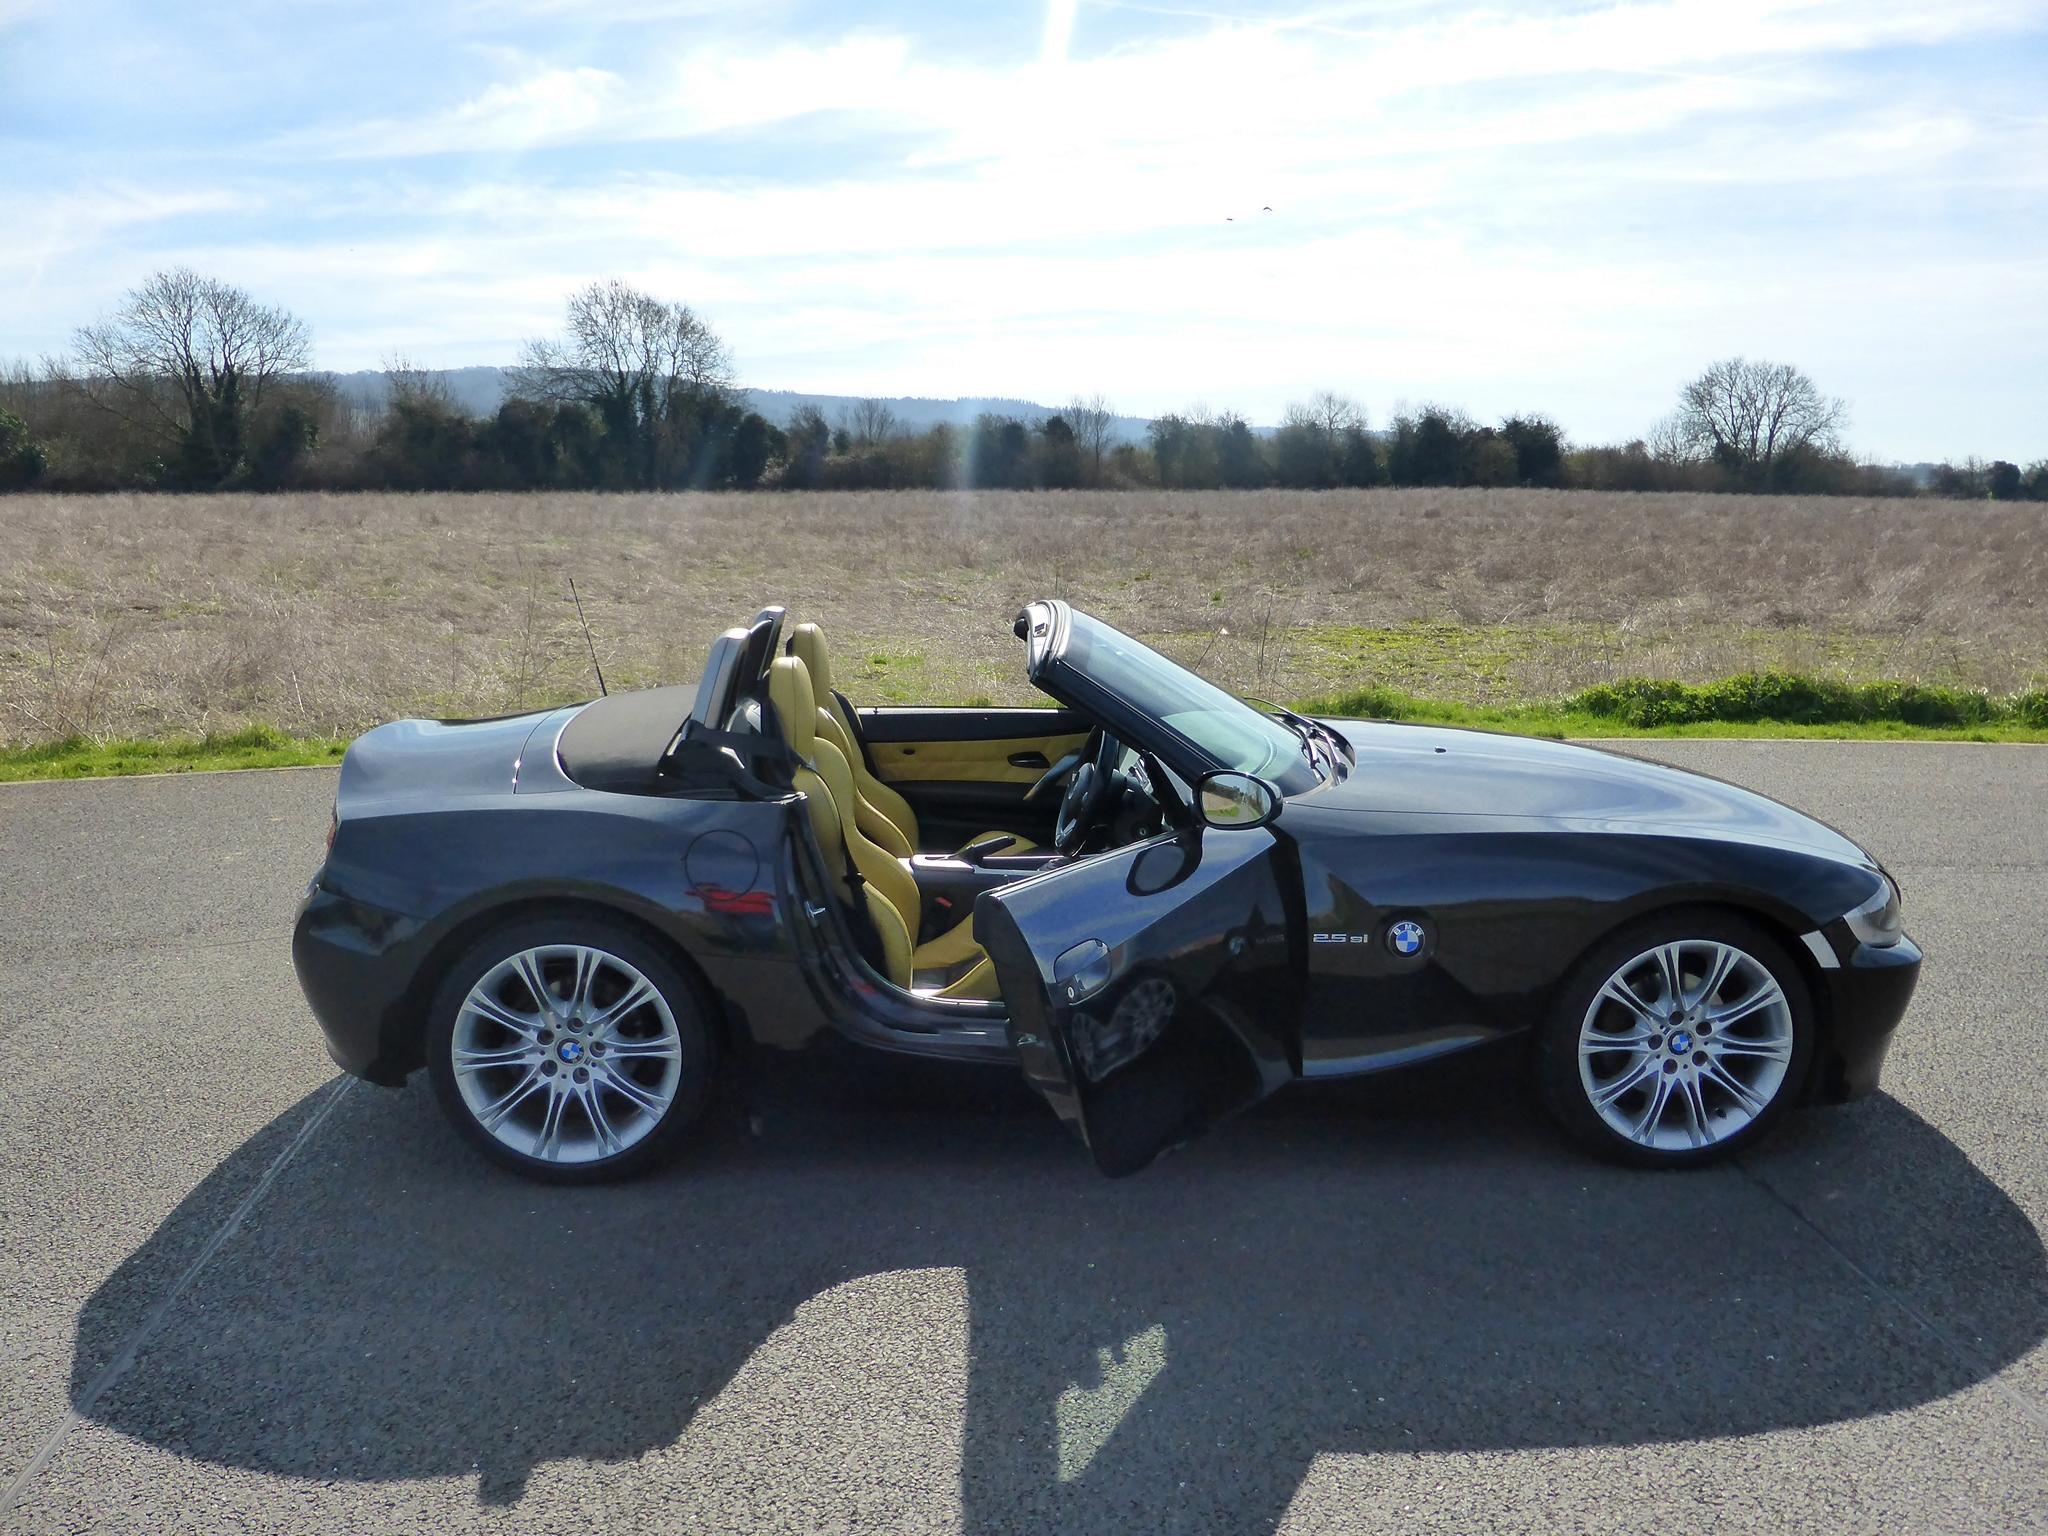 2006 BMW Z4 2.5 Si Sport Roadster - select GT